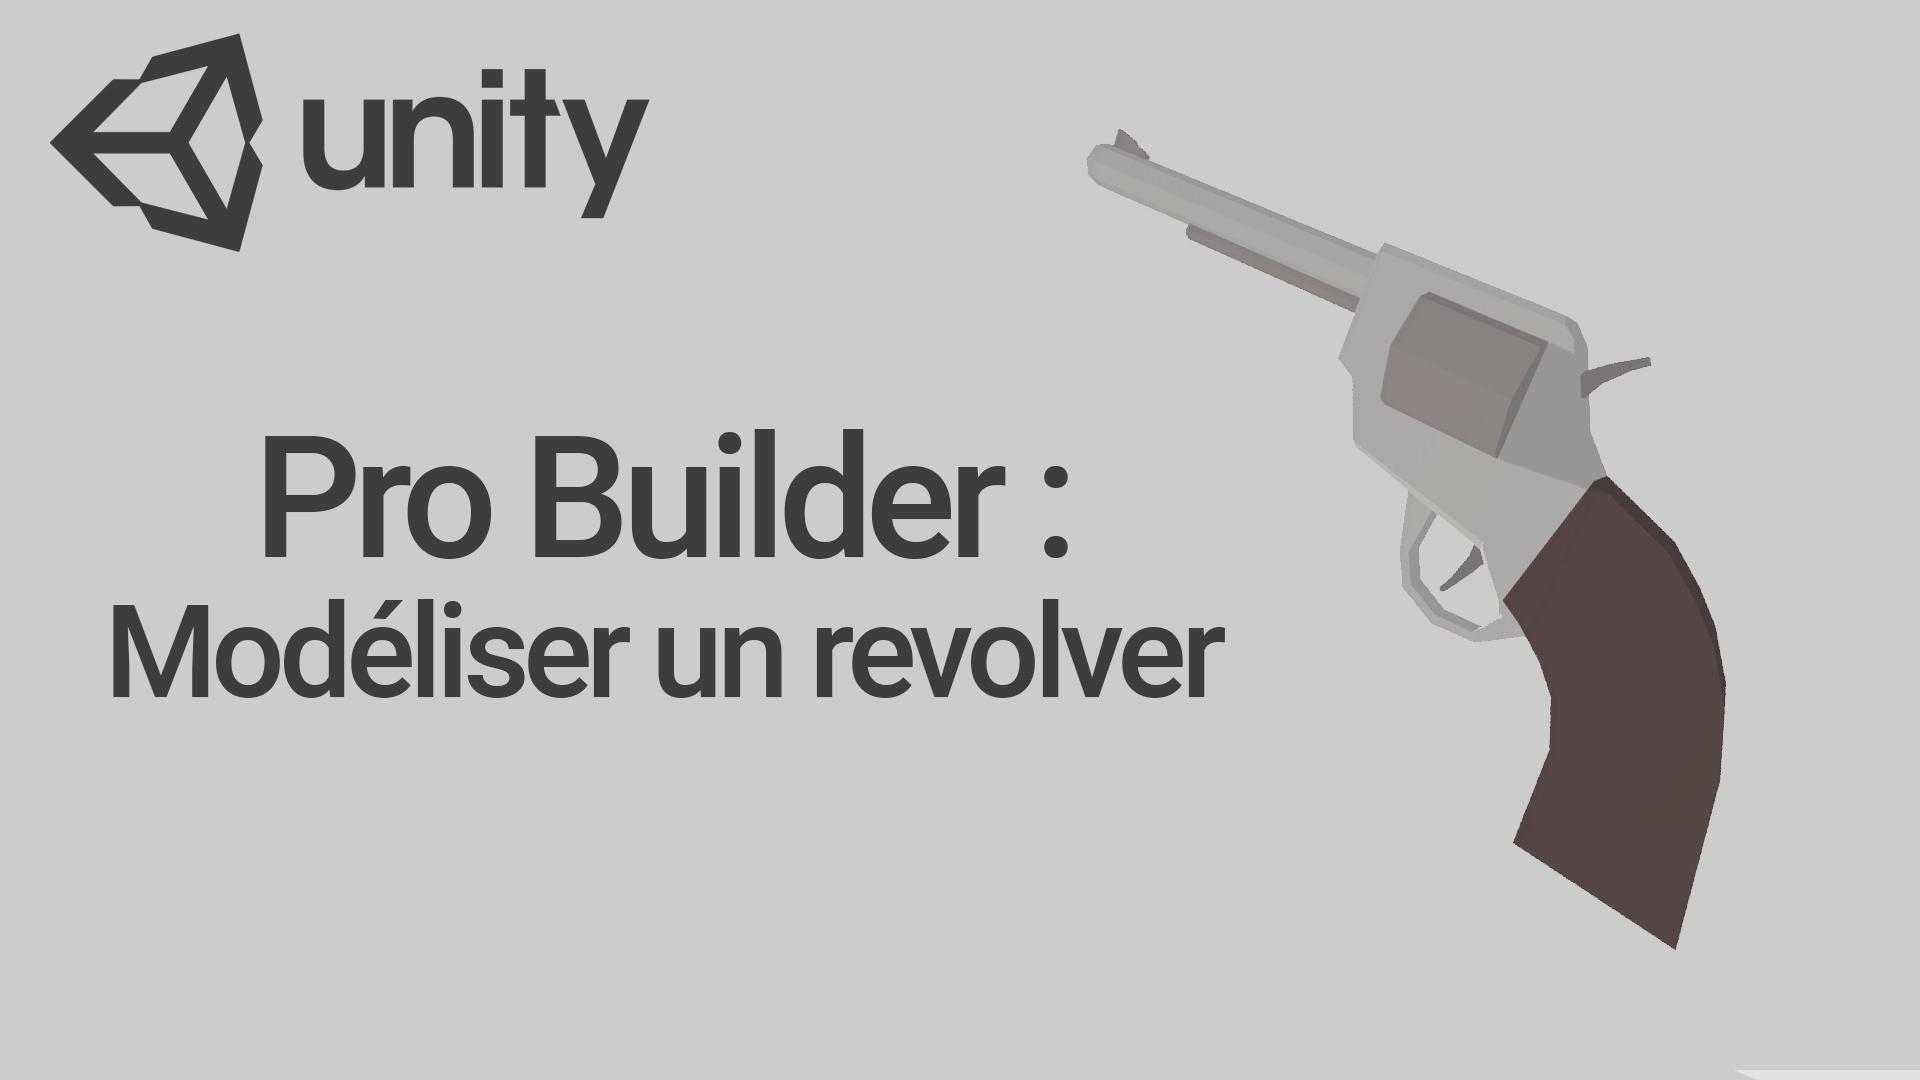 TUTO UNITY FR : ProBuilder : Modéliser un revolver (Unity 3D)